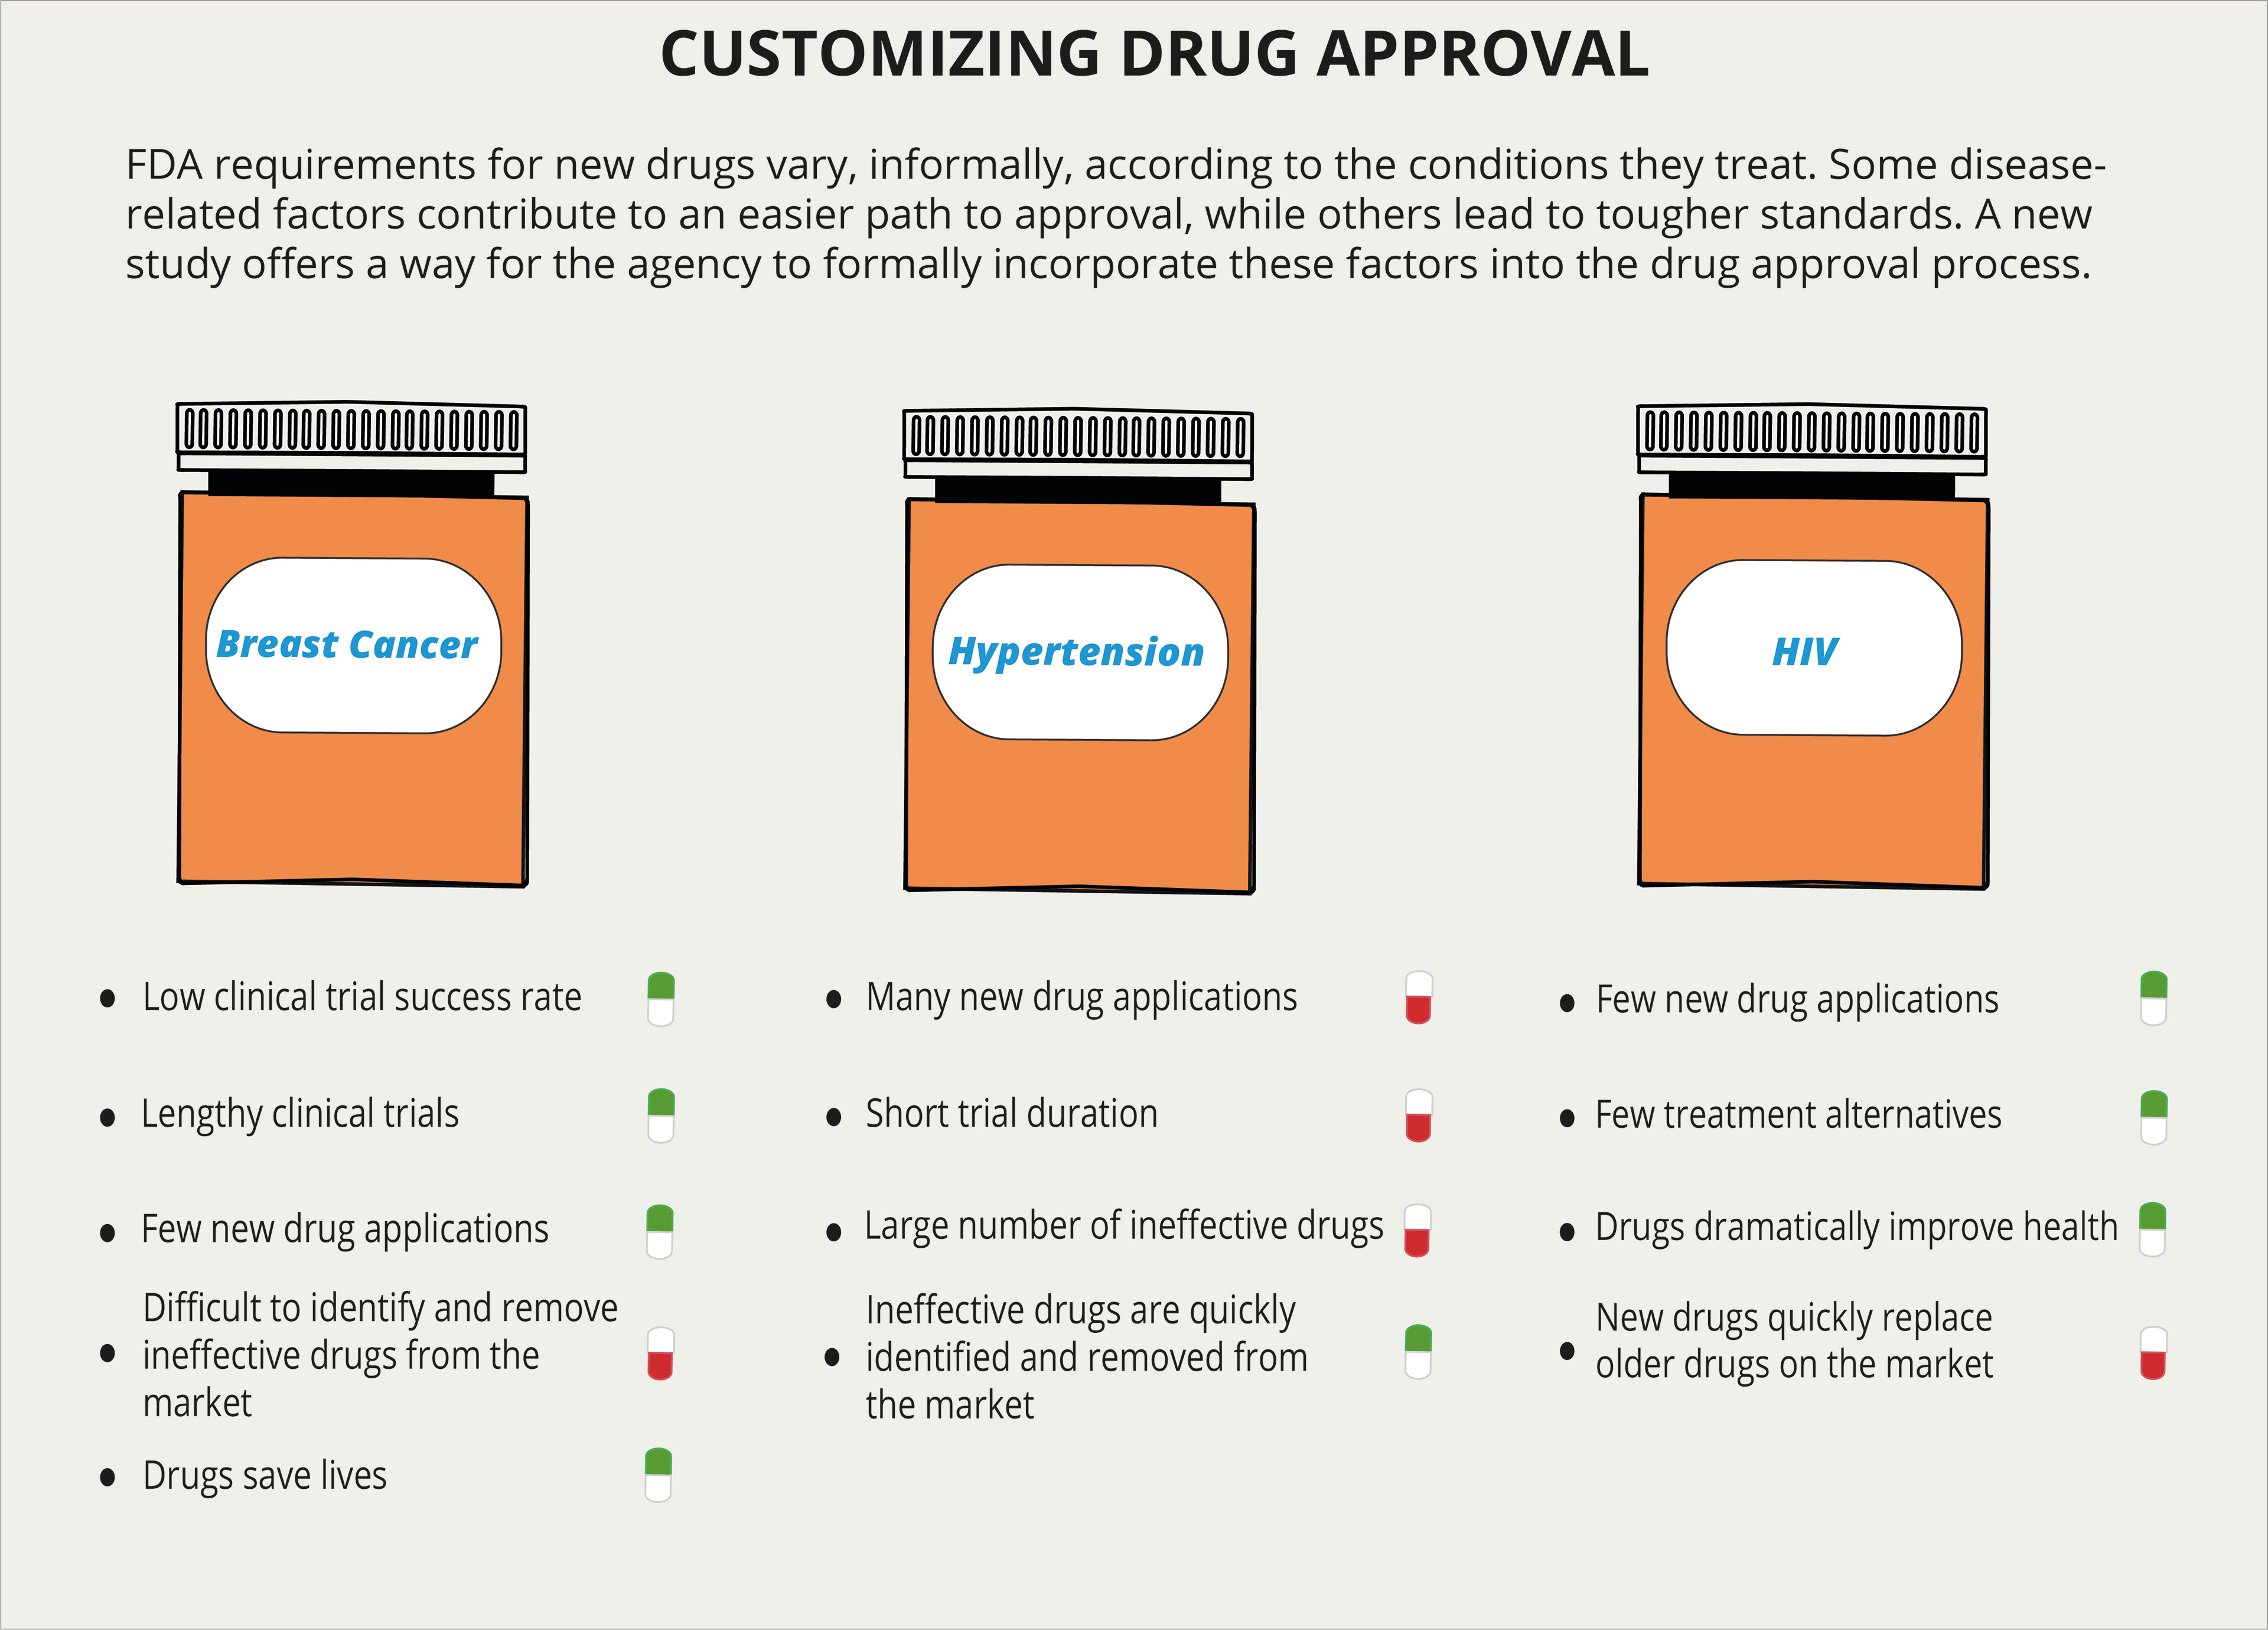 Monika Brown - FDA Infographic